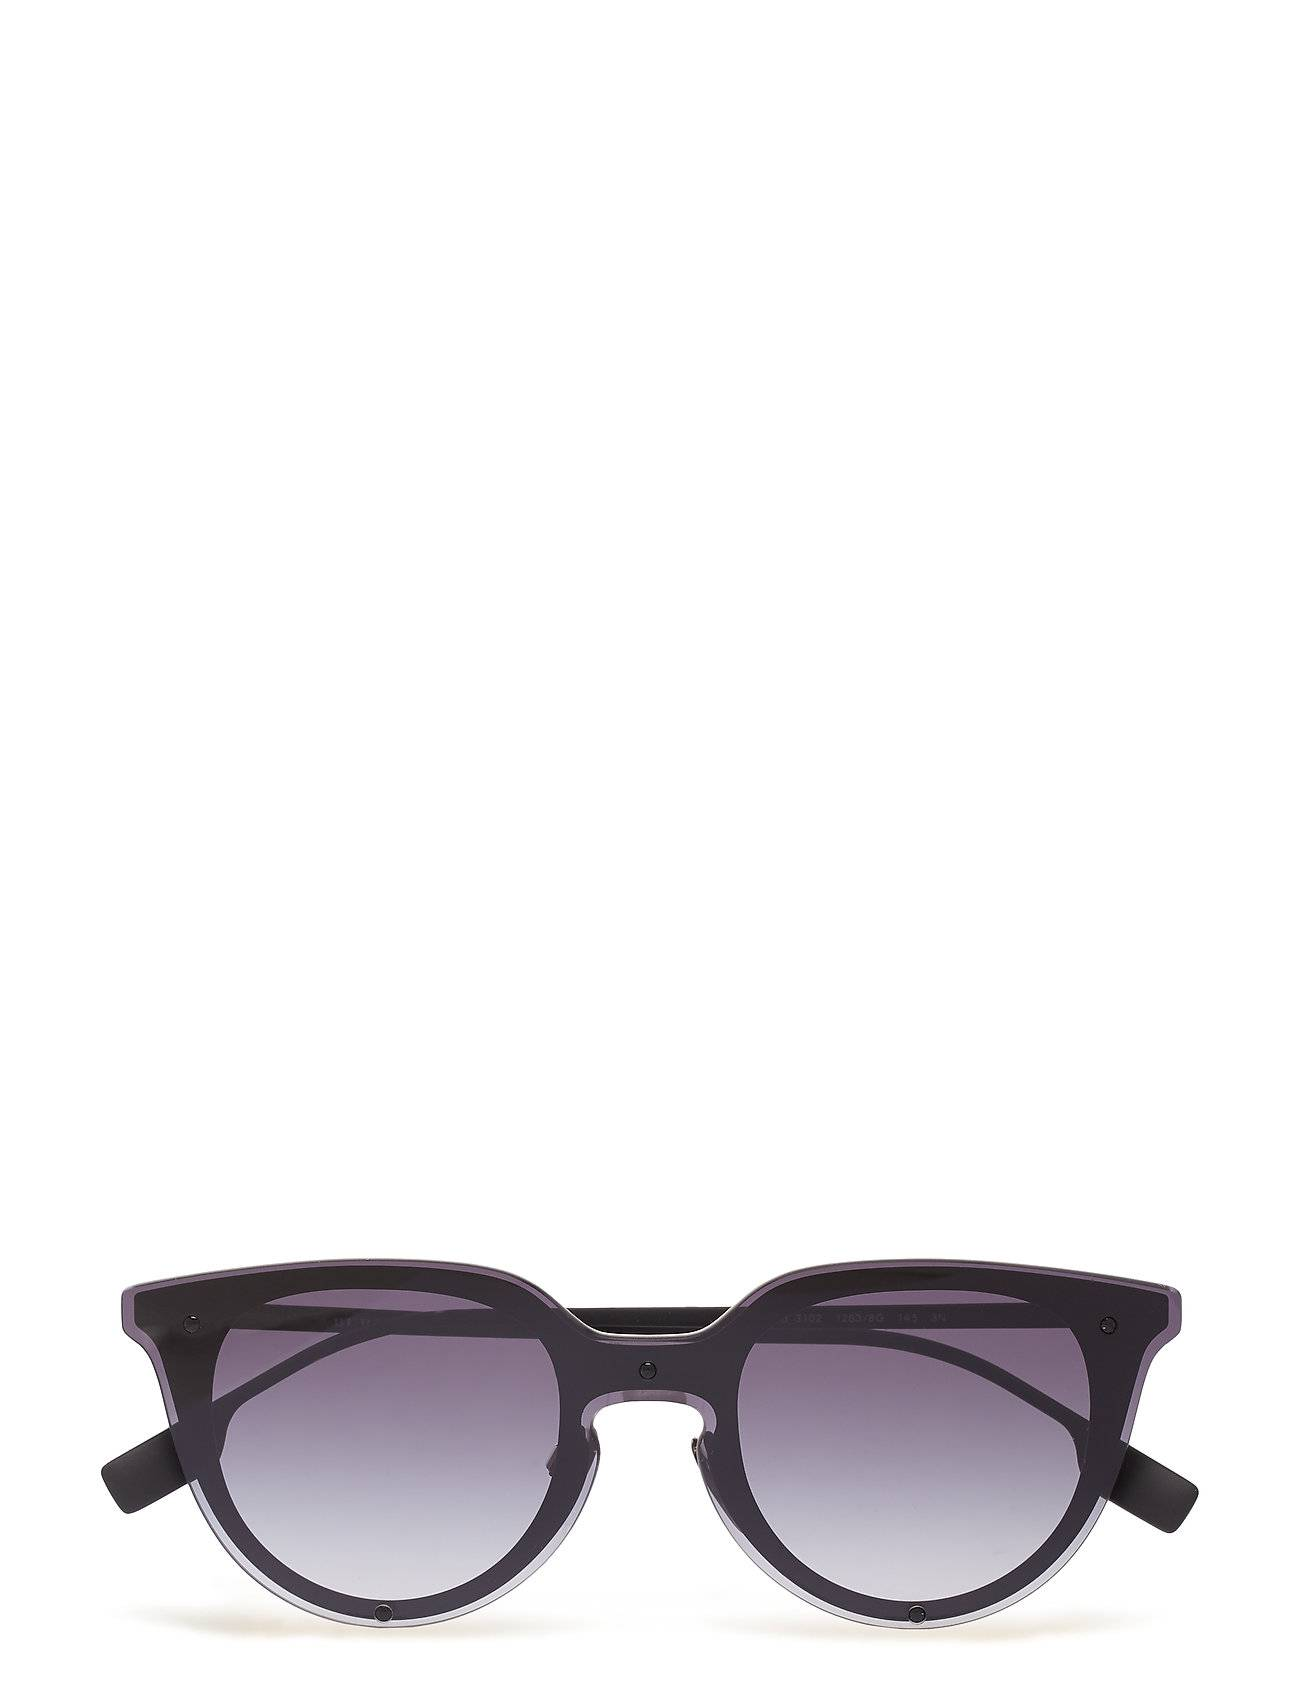 Image of Burberry Sunglasses 0be3102 Aurinkolasit Musta Burberry Sunglasses